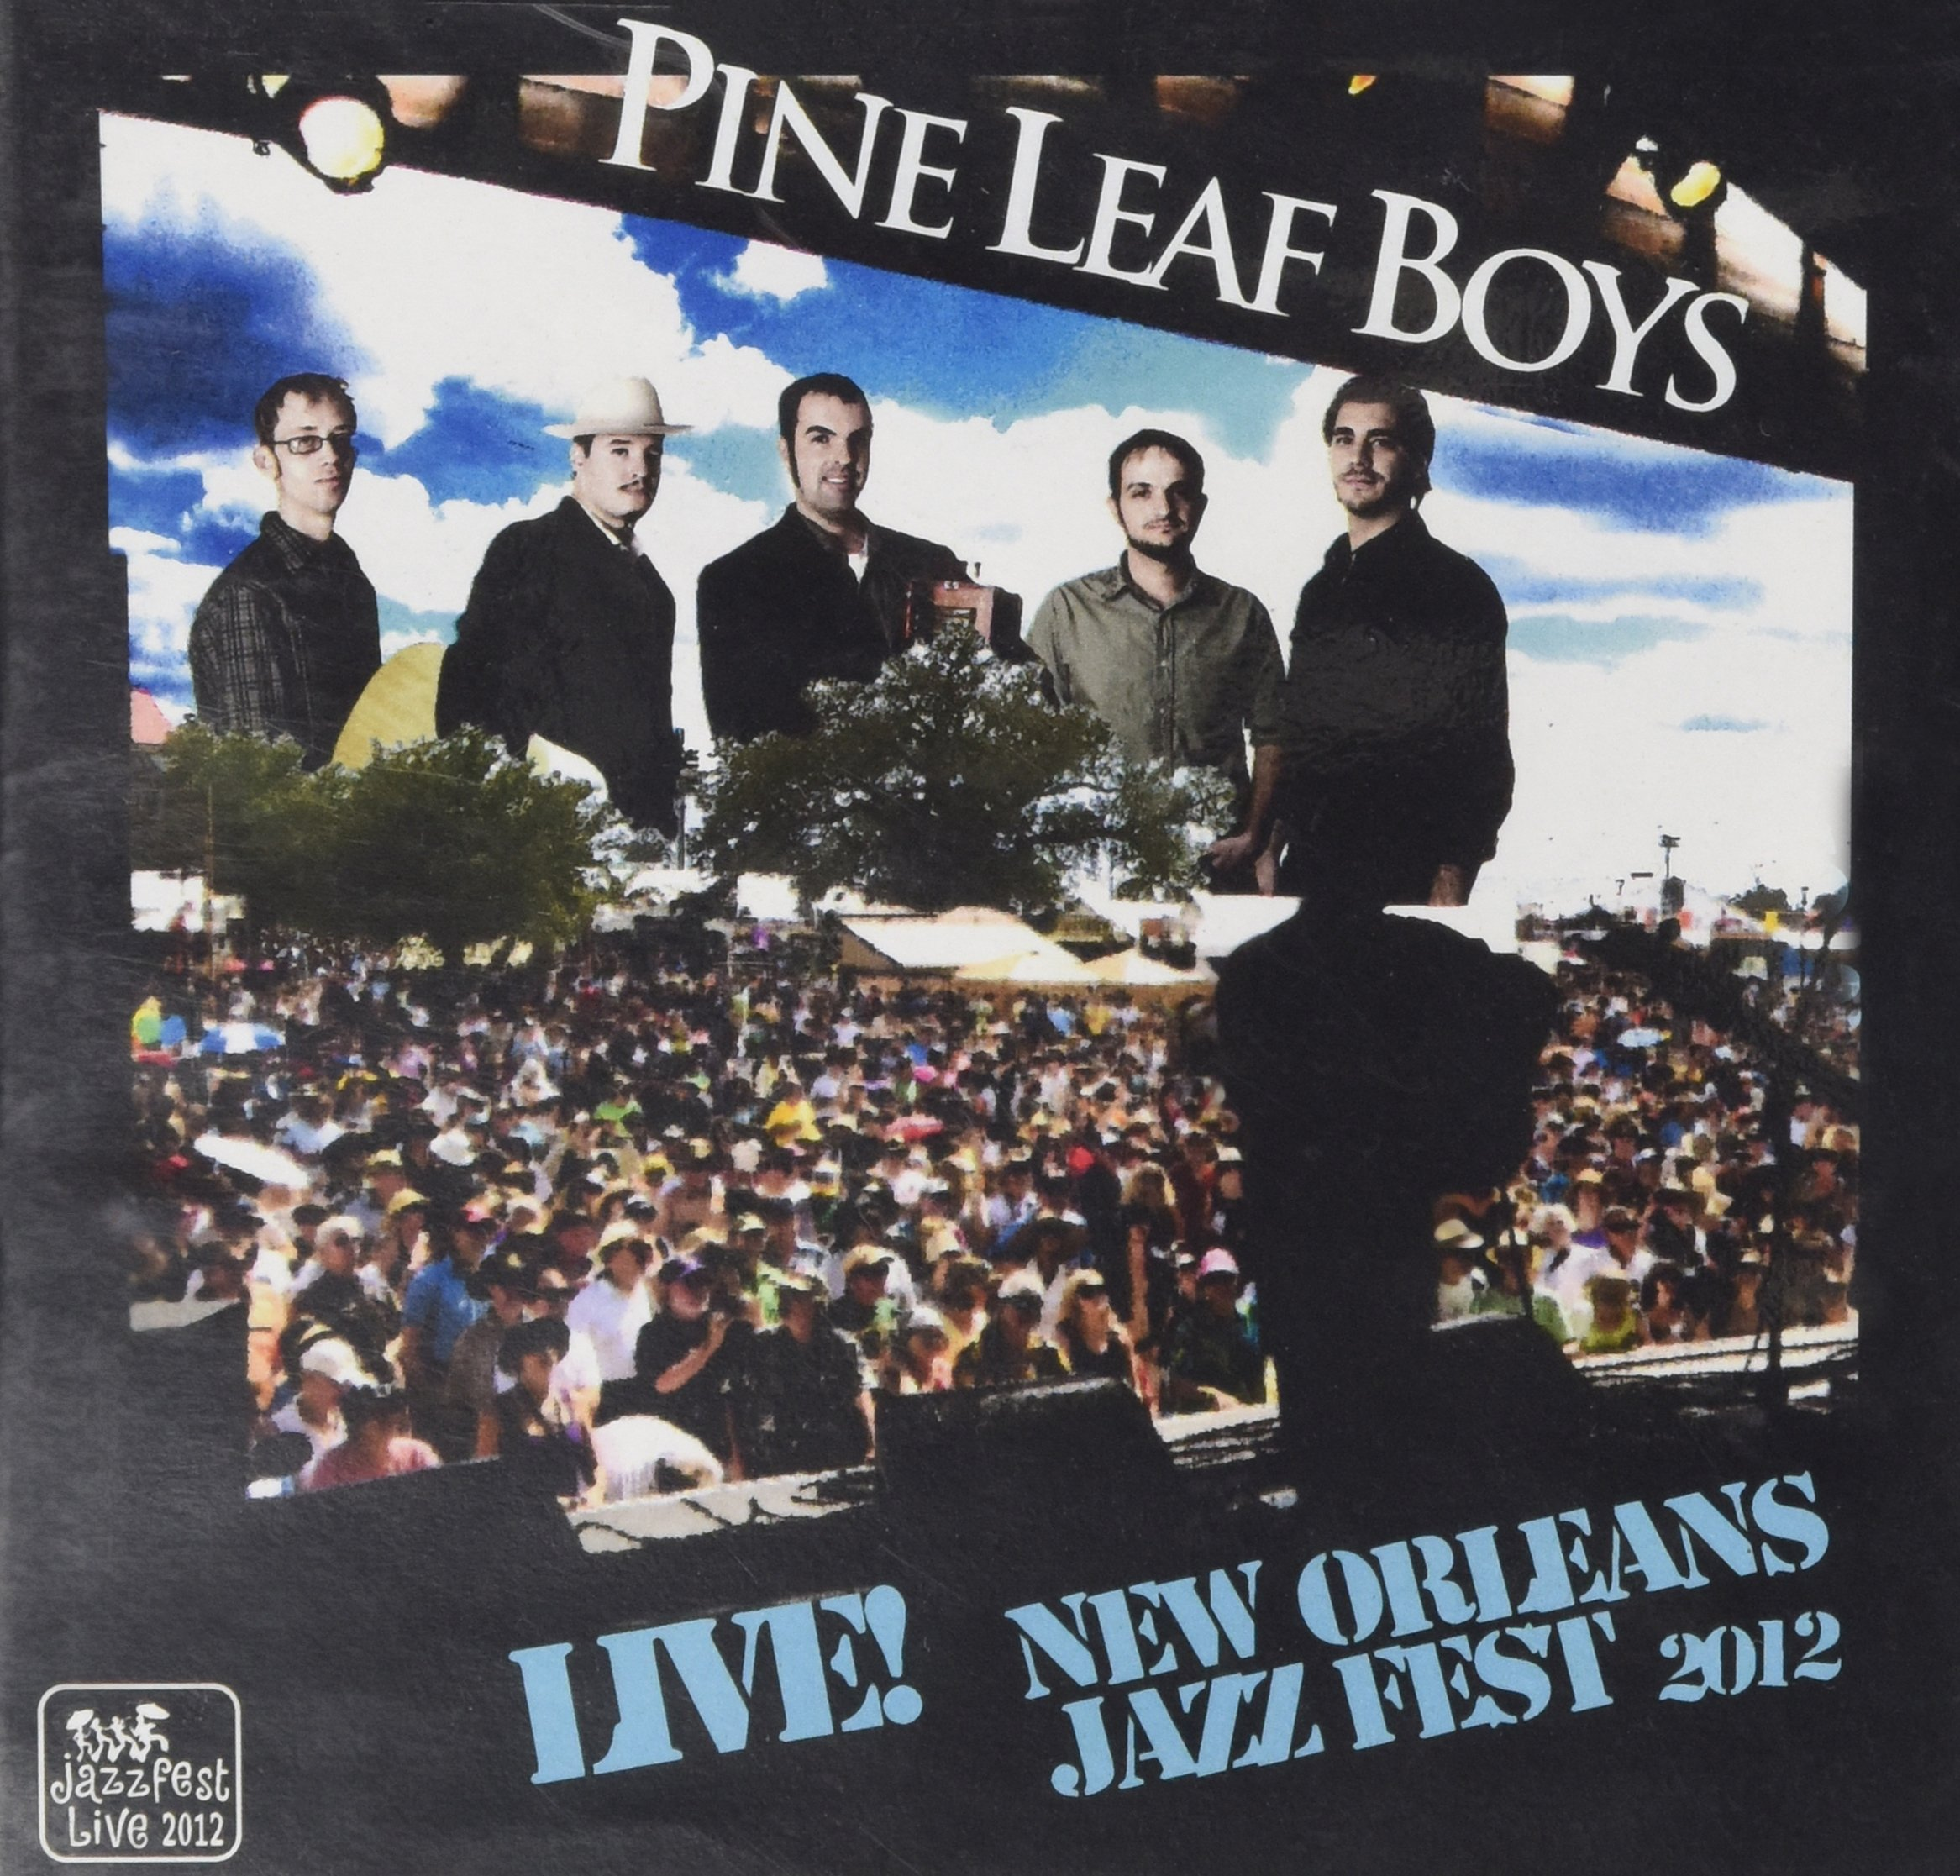 Live at Jazzfest 2012